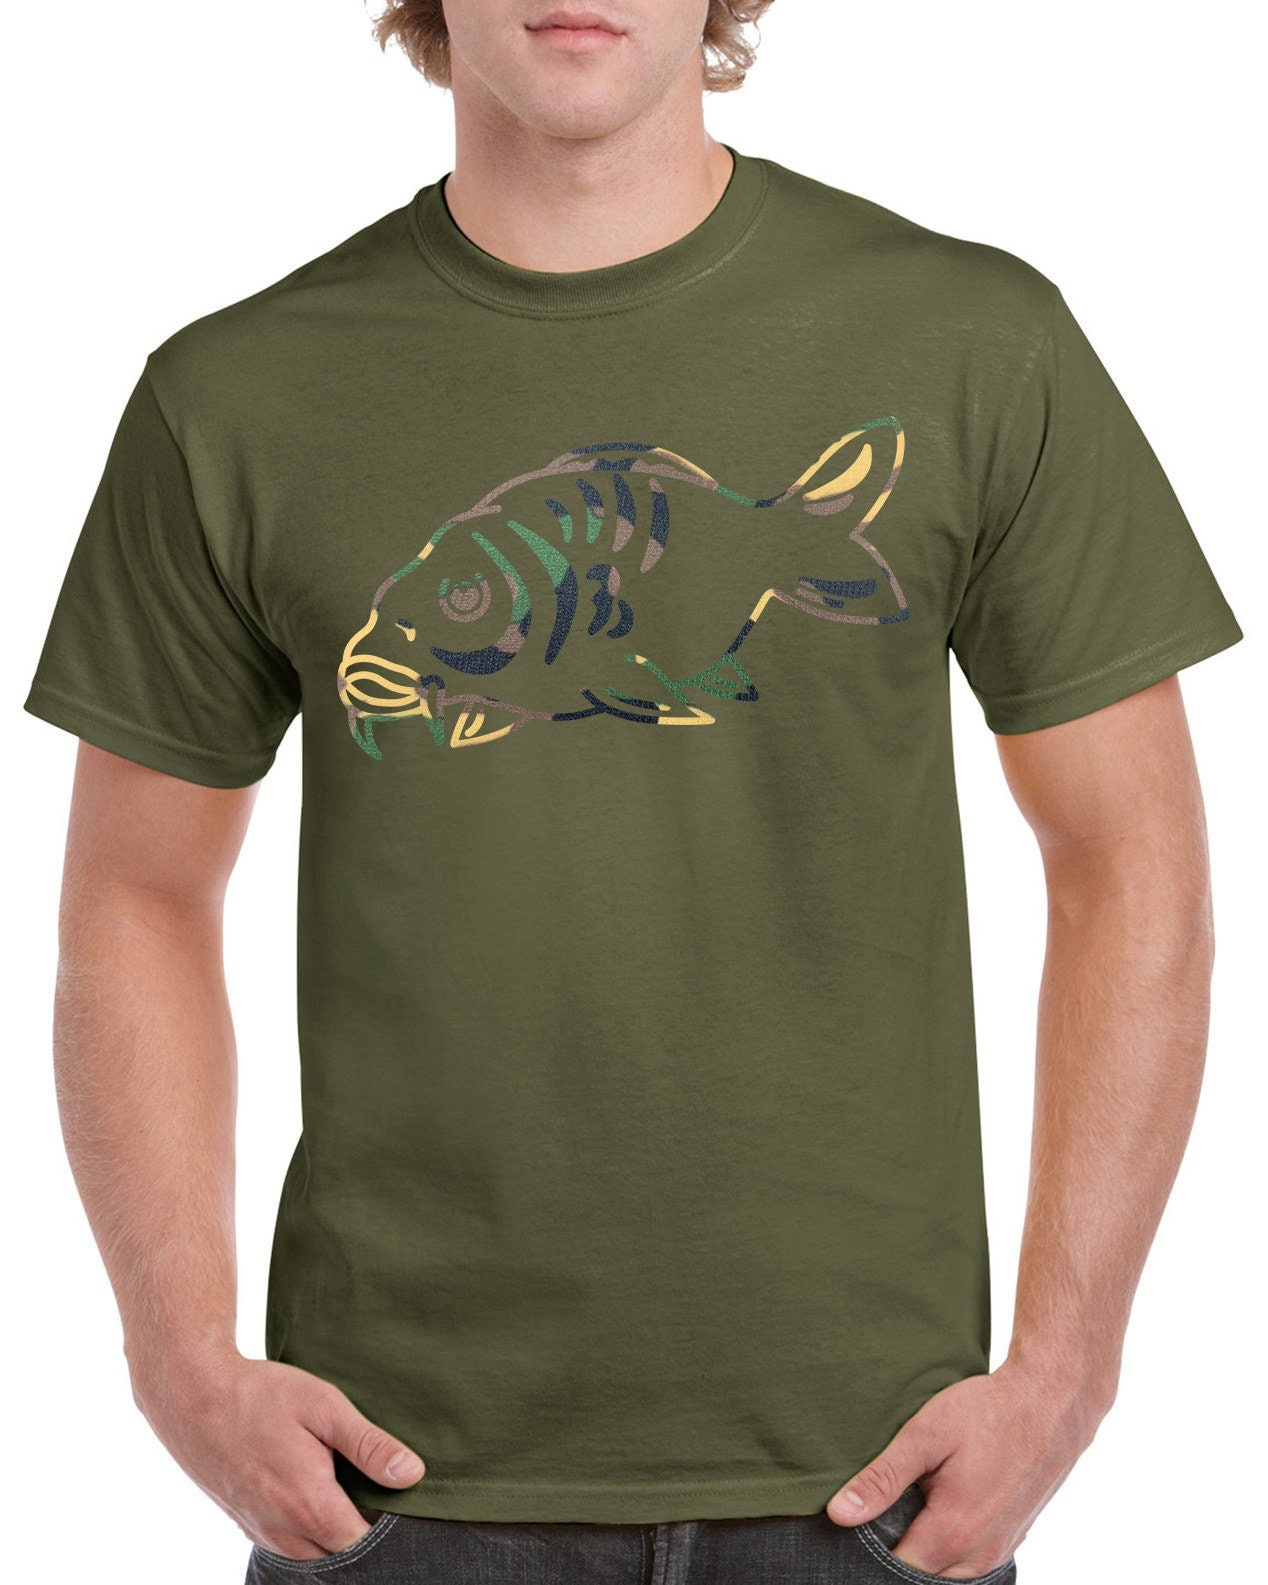 FISH LOGO Carp fishing logo t shirt  ideal gift for fisherman